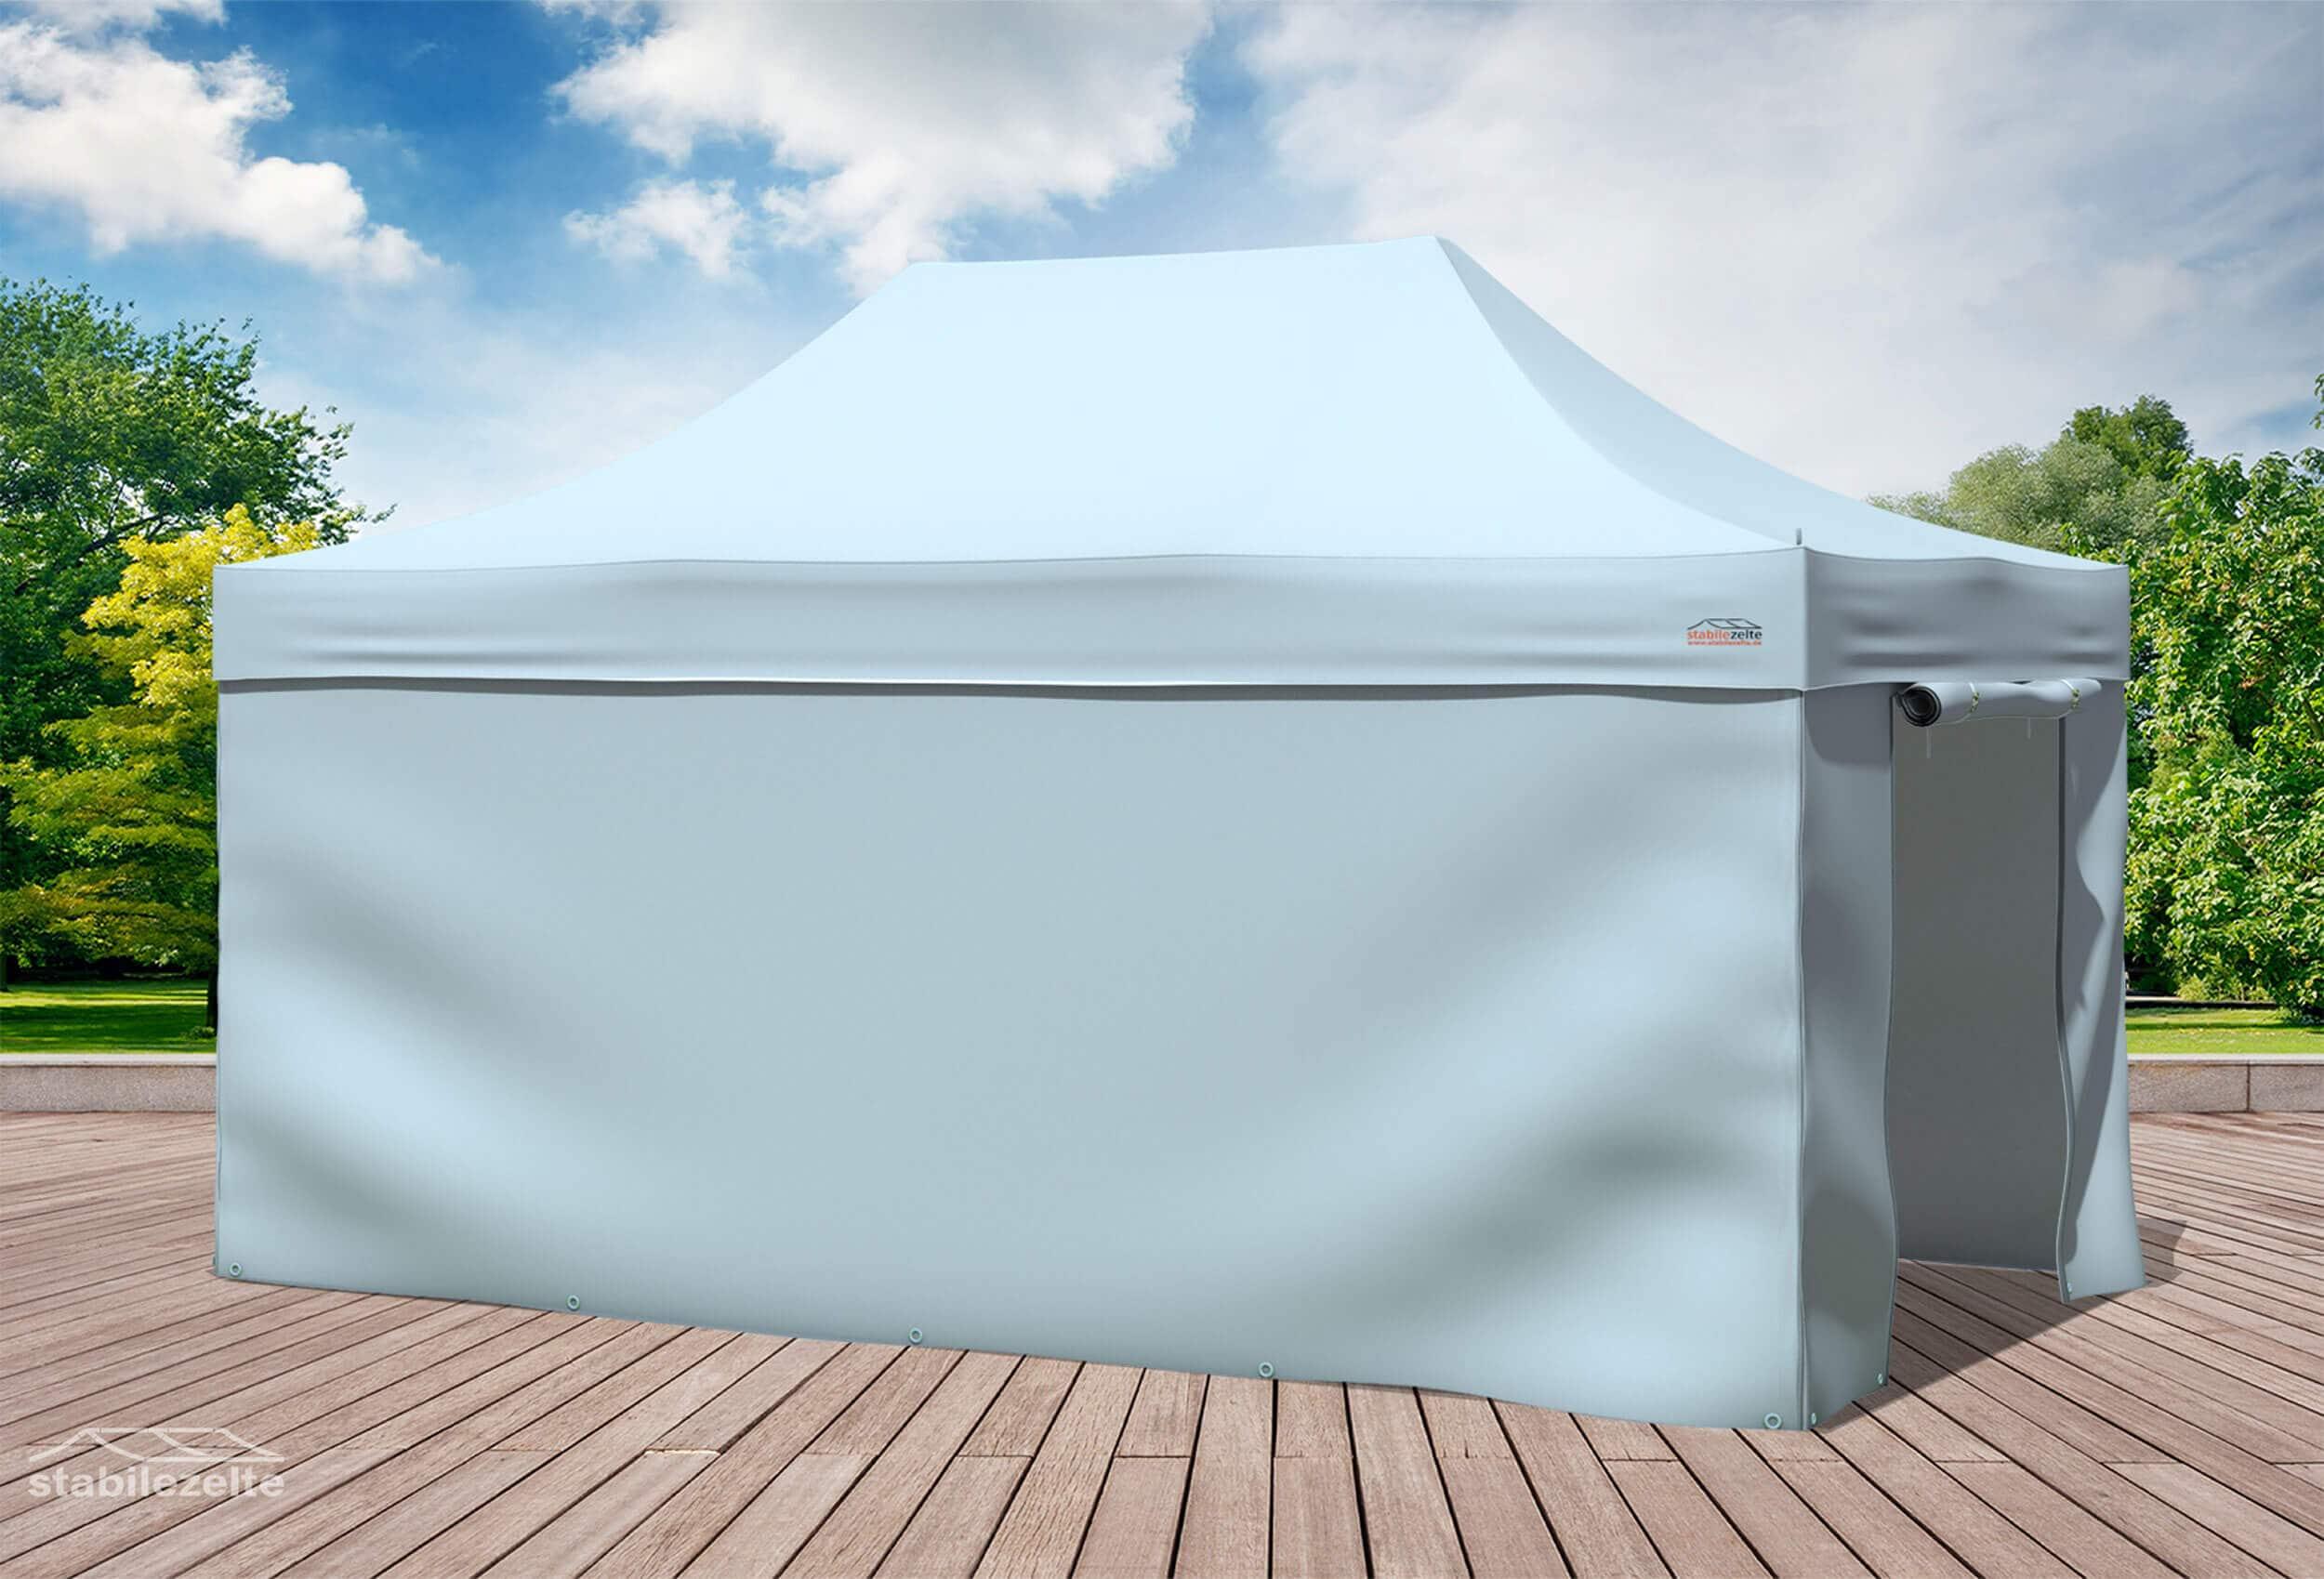 3x4 5 m faltpavillon grau professional plus serie faltpavillons. Black Bedroom Furniture Sets. Home Design Ideas